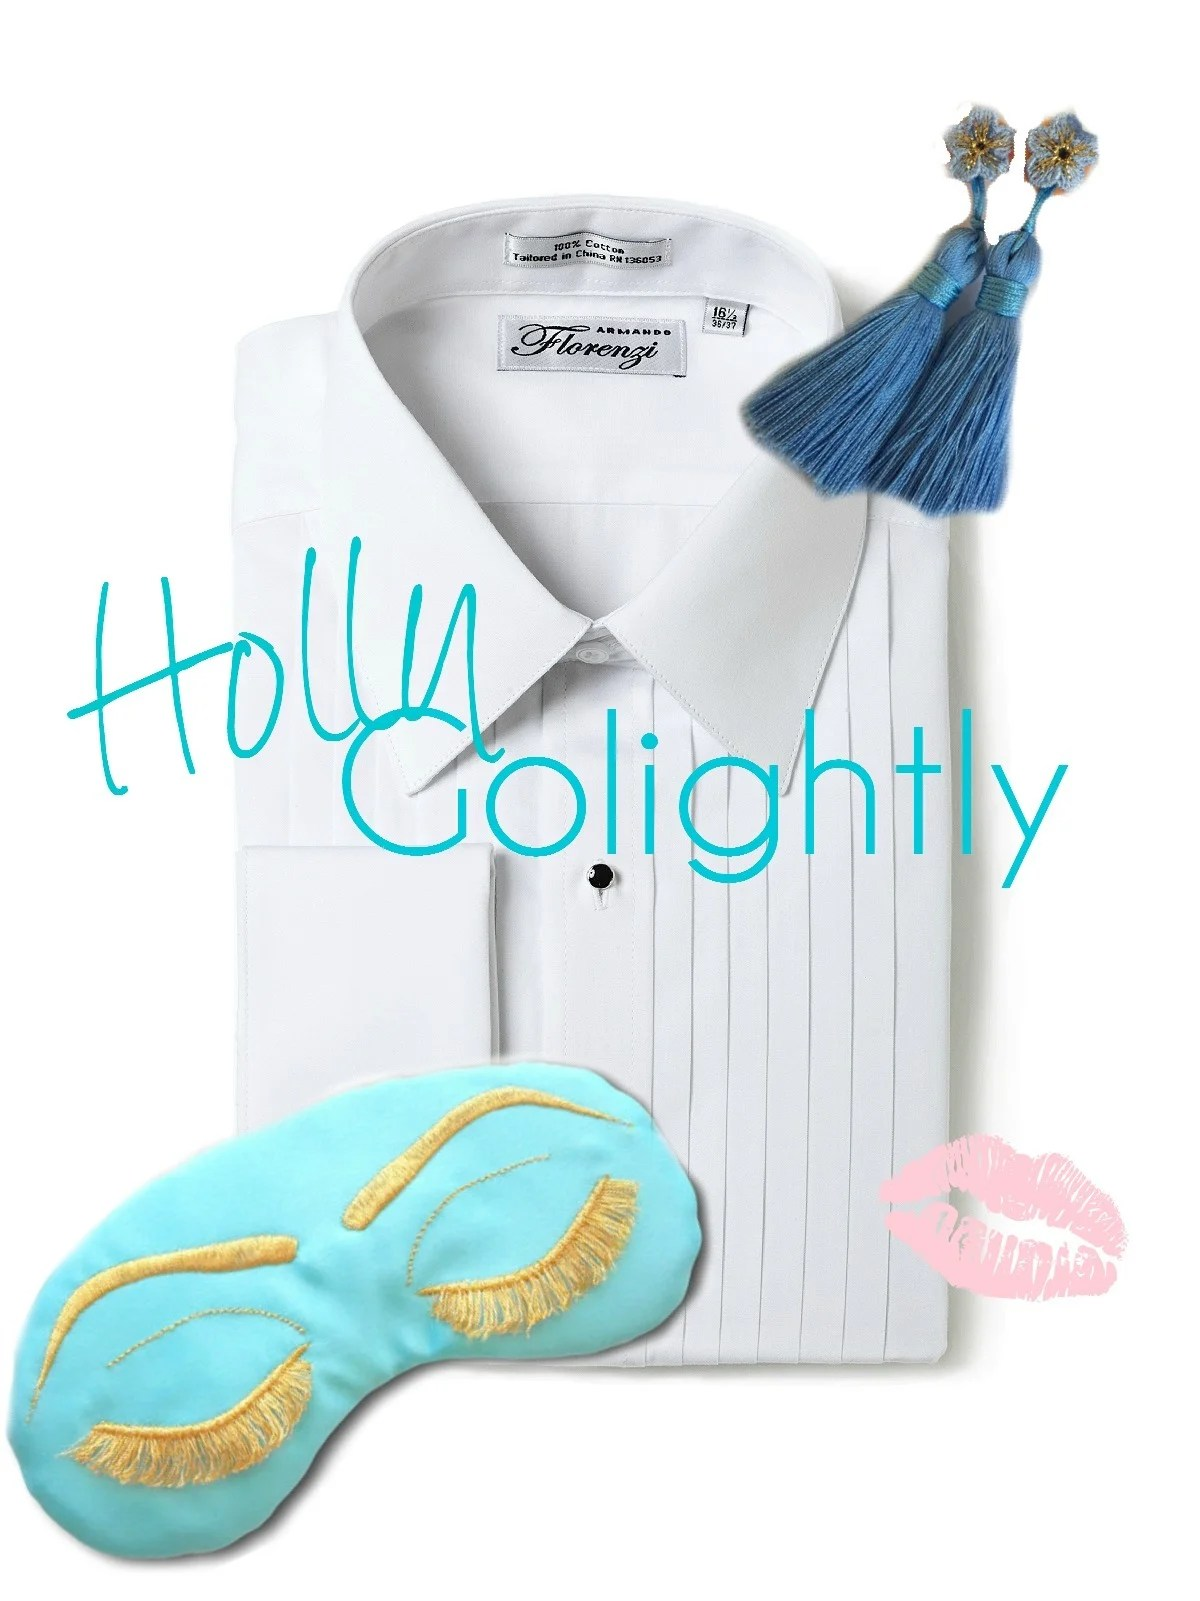 Holly Golightly-Audrey Hepburn